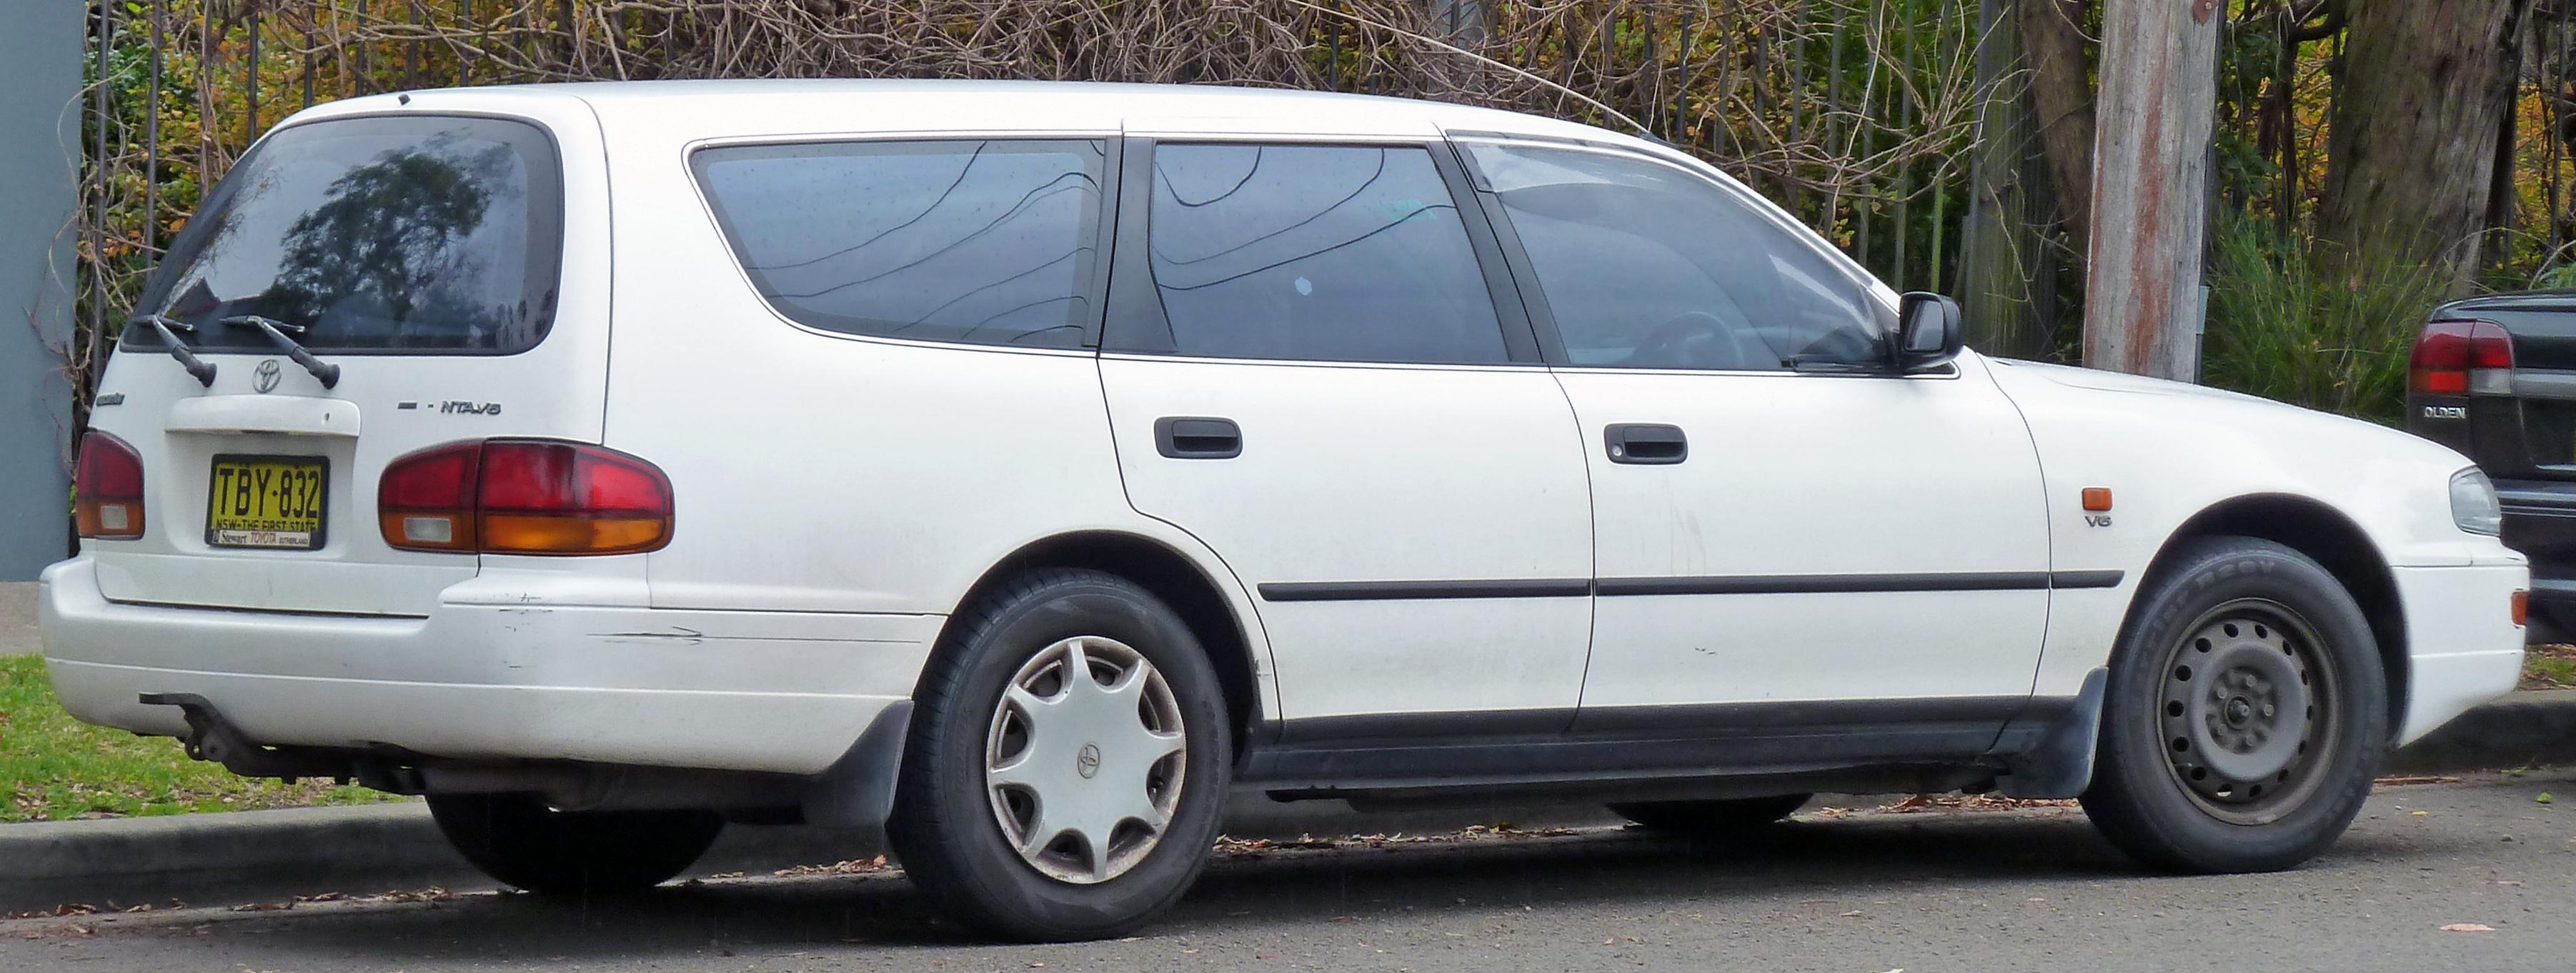 File 1993 1994 Toyota Camry Vienta Vdv10 Executive